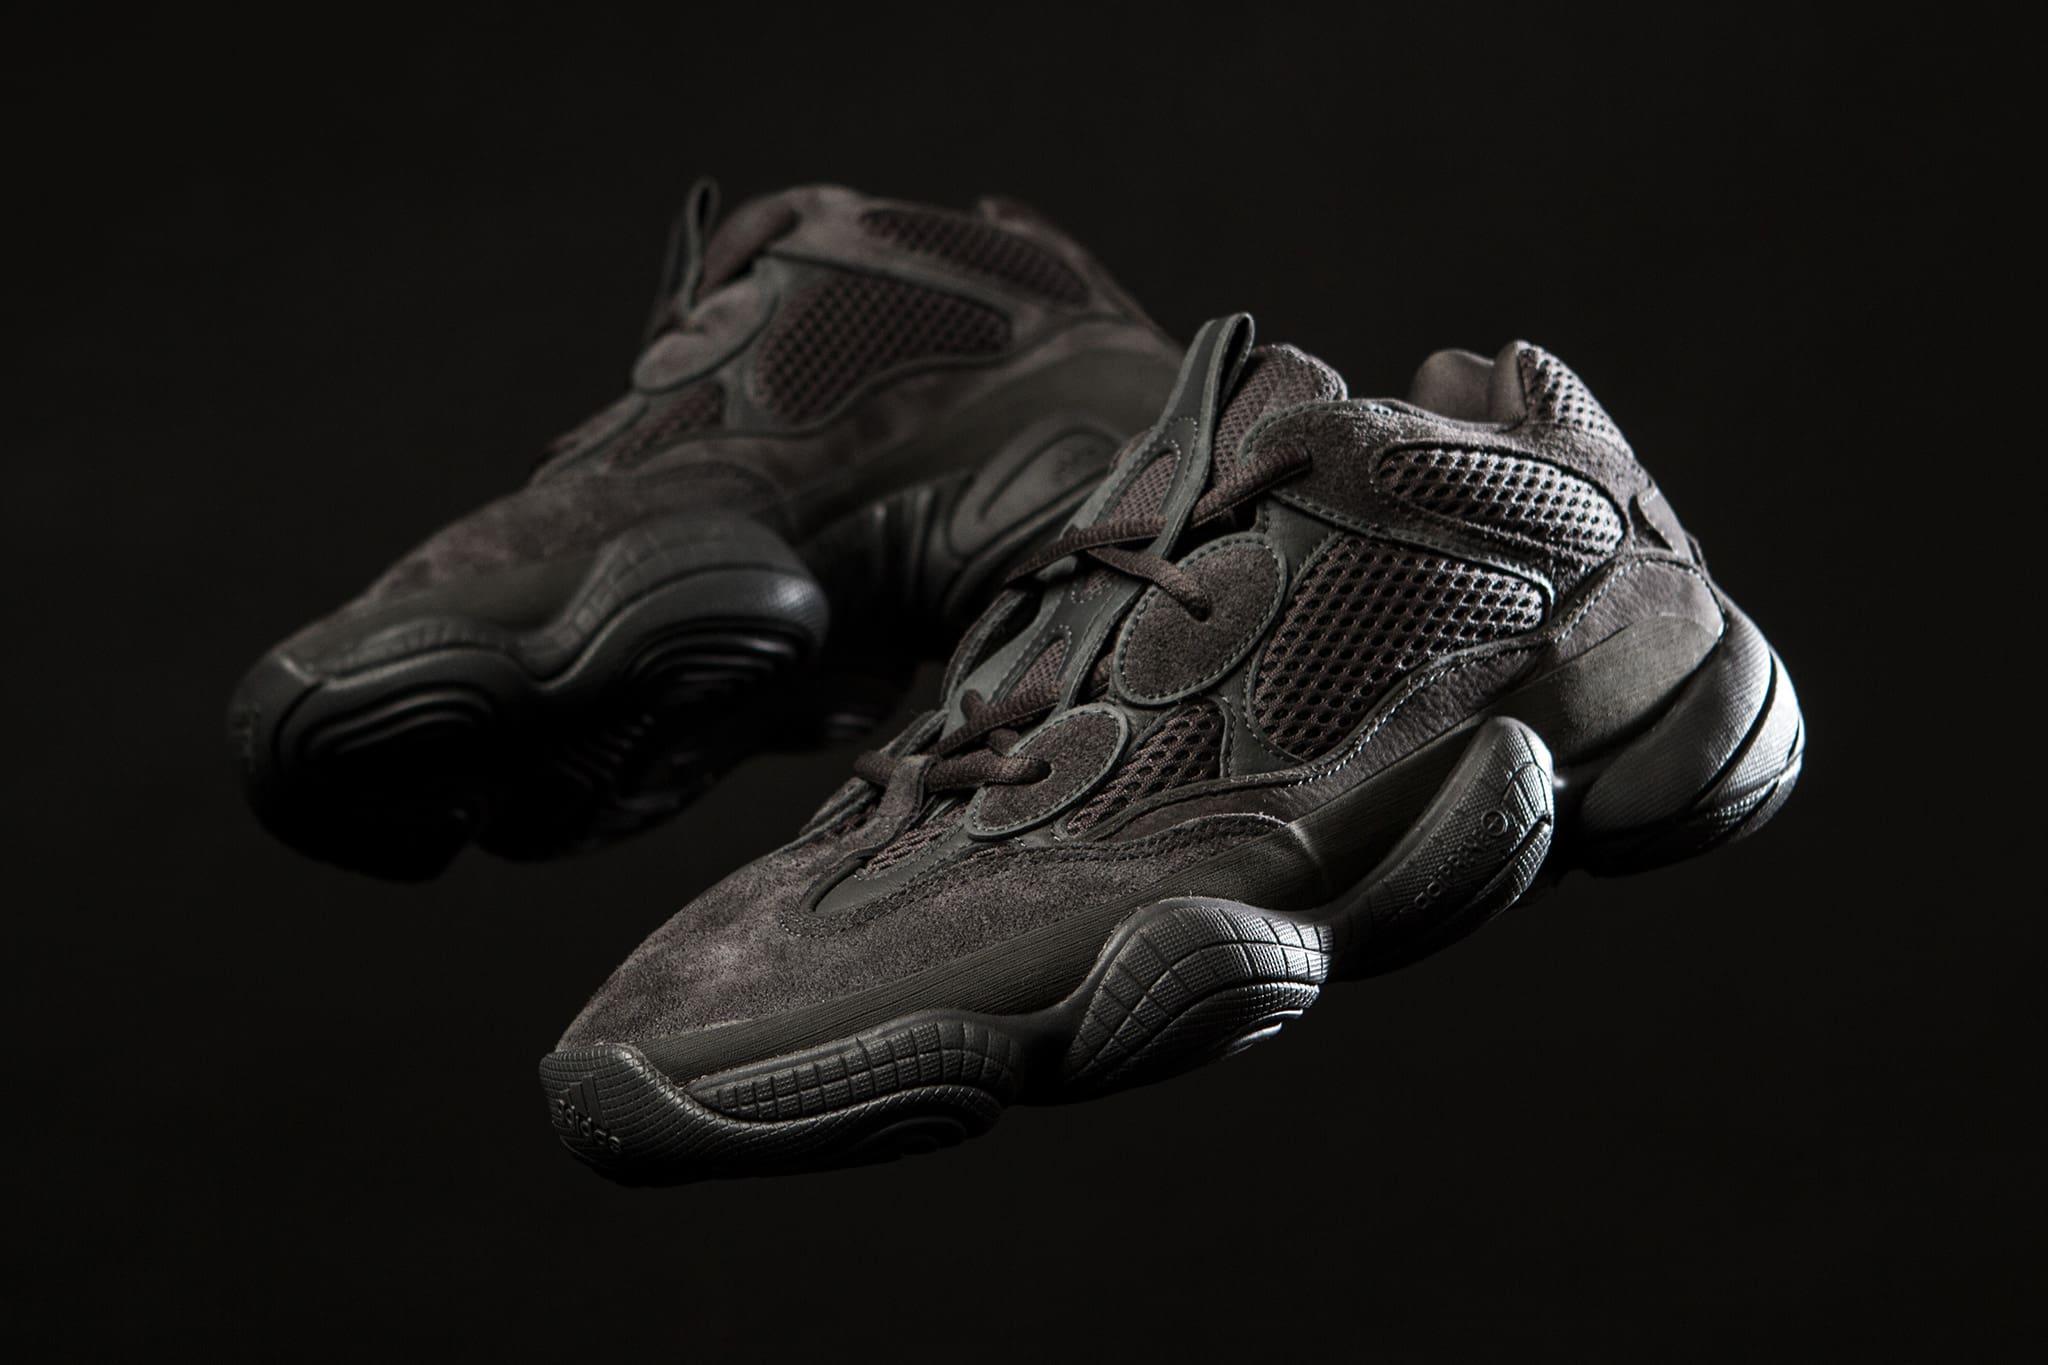 meet 37f6e 26adf adidas Yeezy 500 'Utility Black'   Release Date: 07.07.18 ...